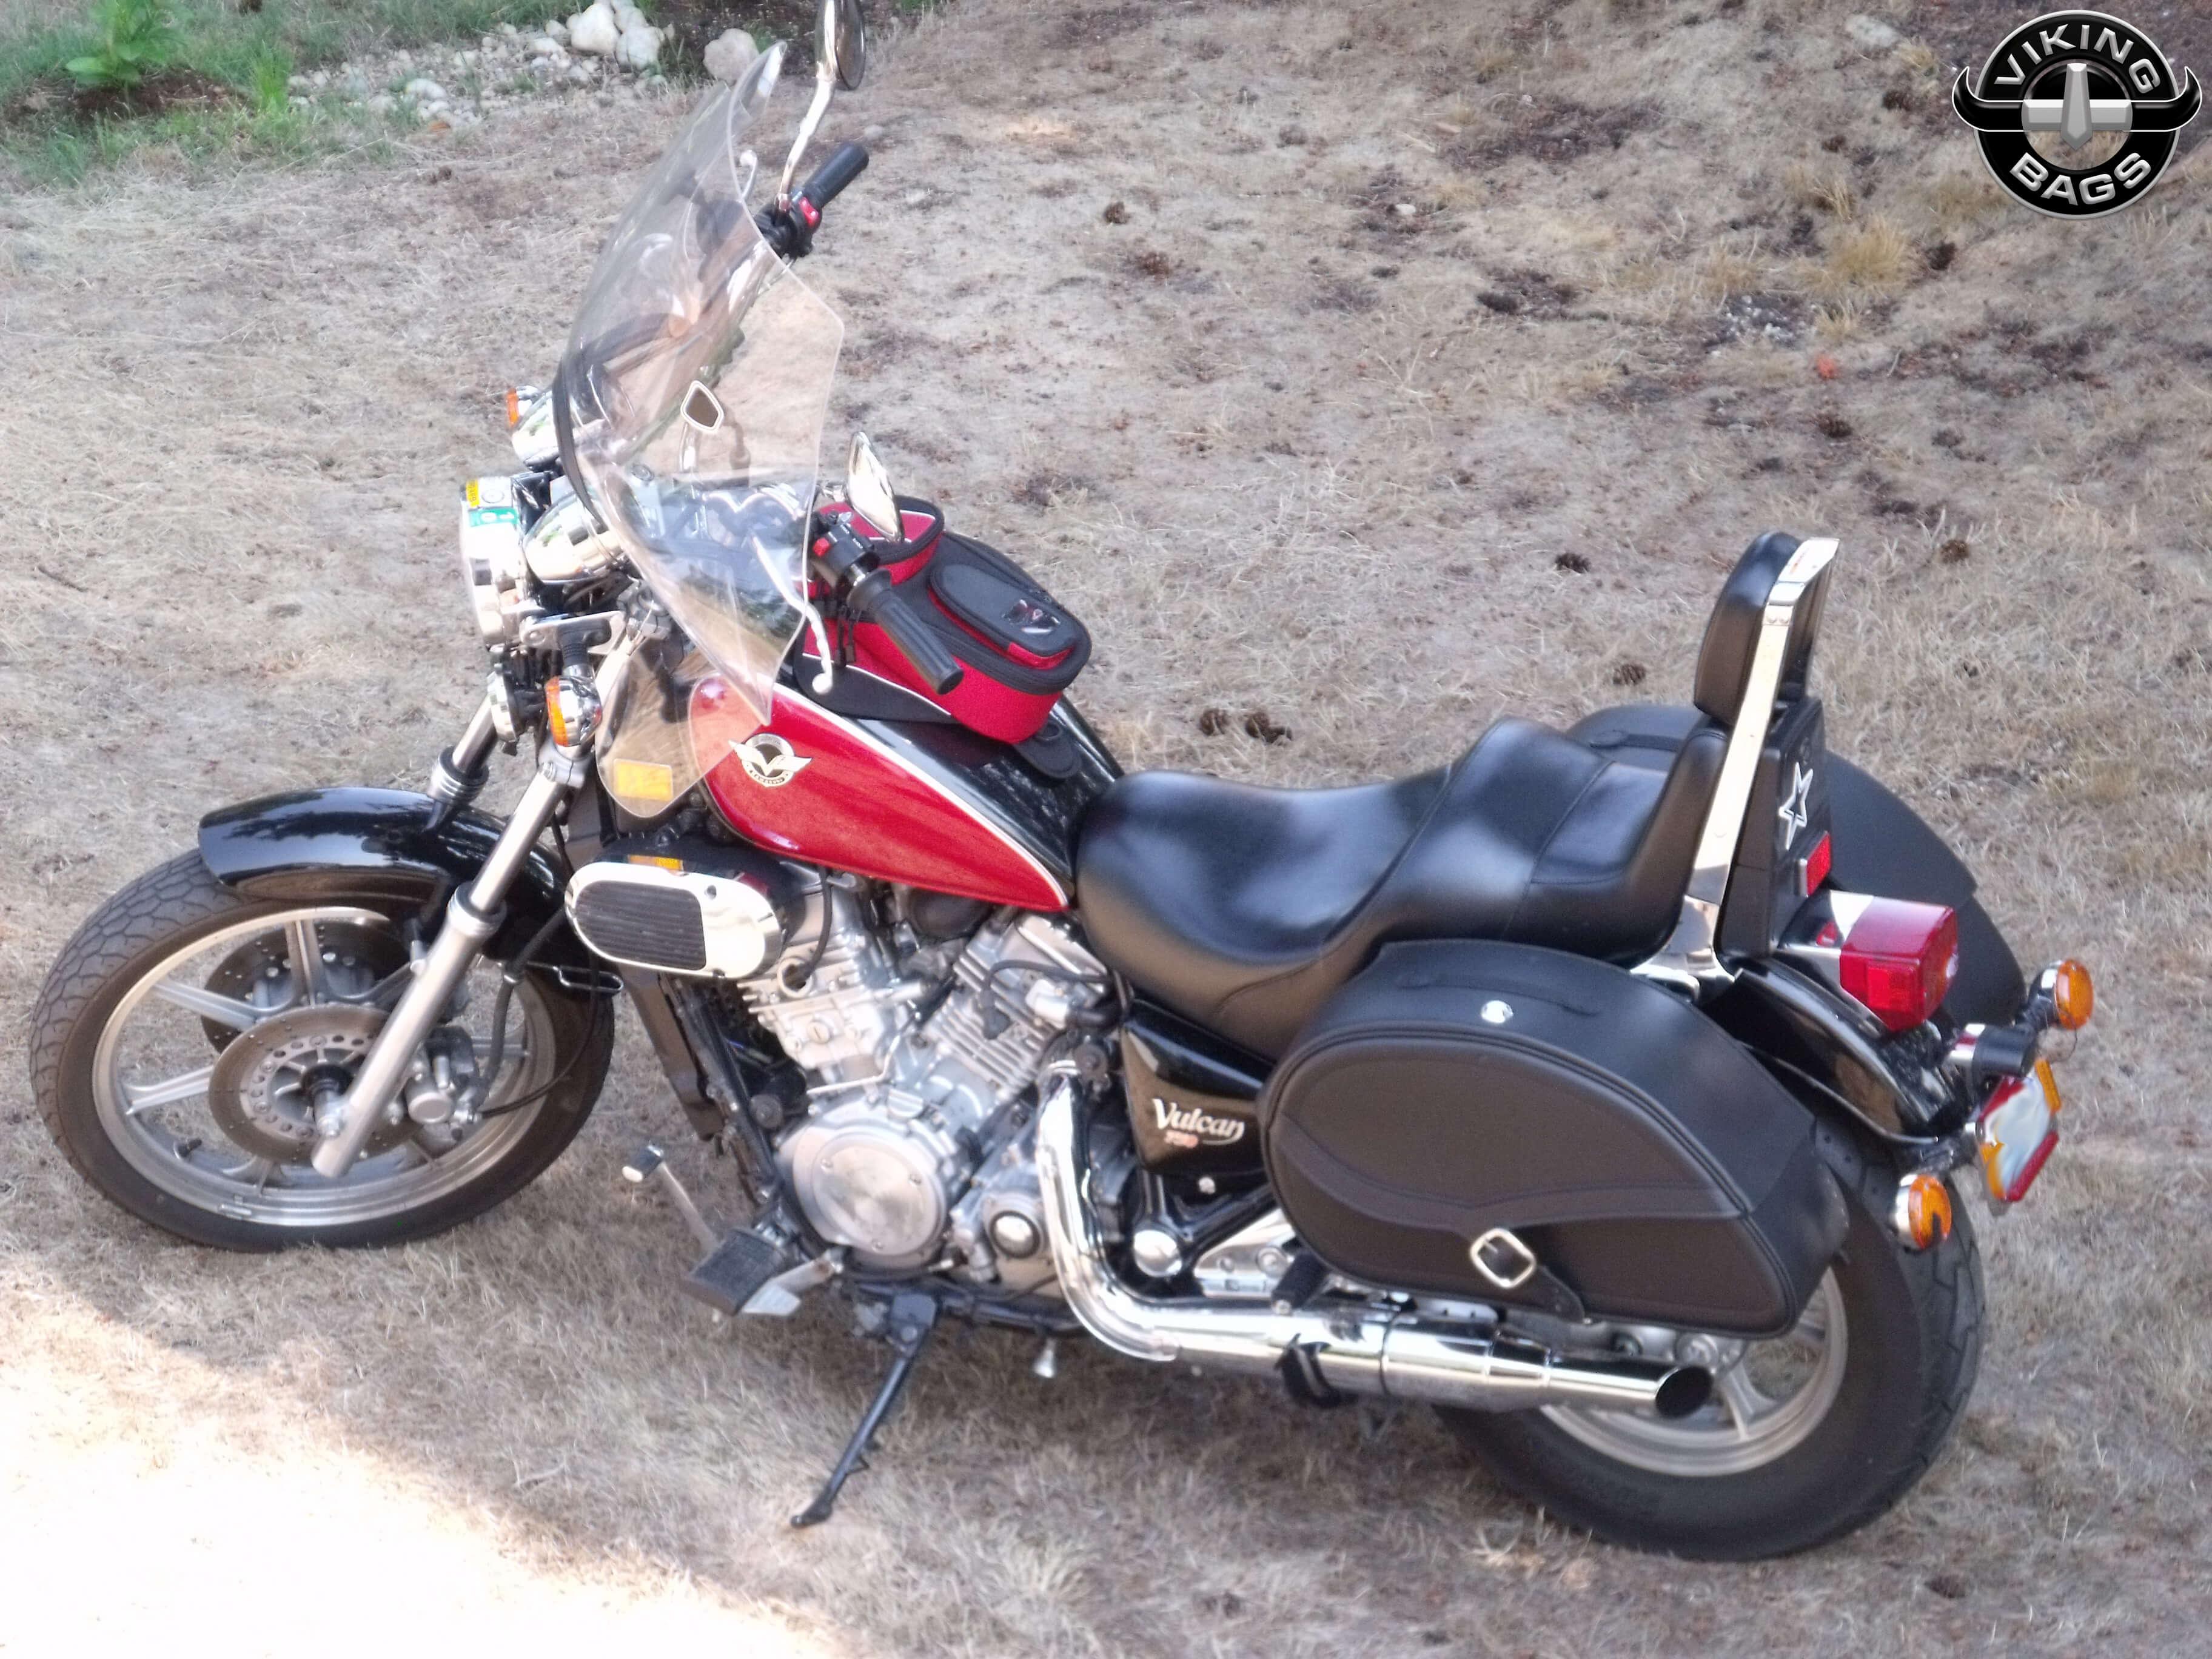 my bike pictured in national website - kawasaki vulcan 750 forum